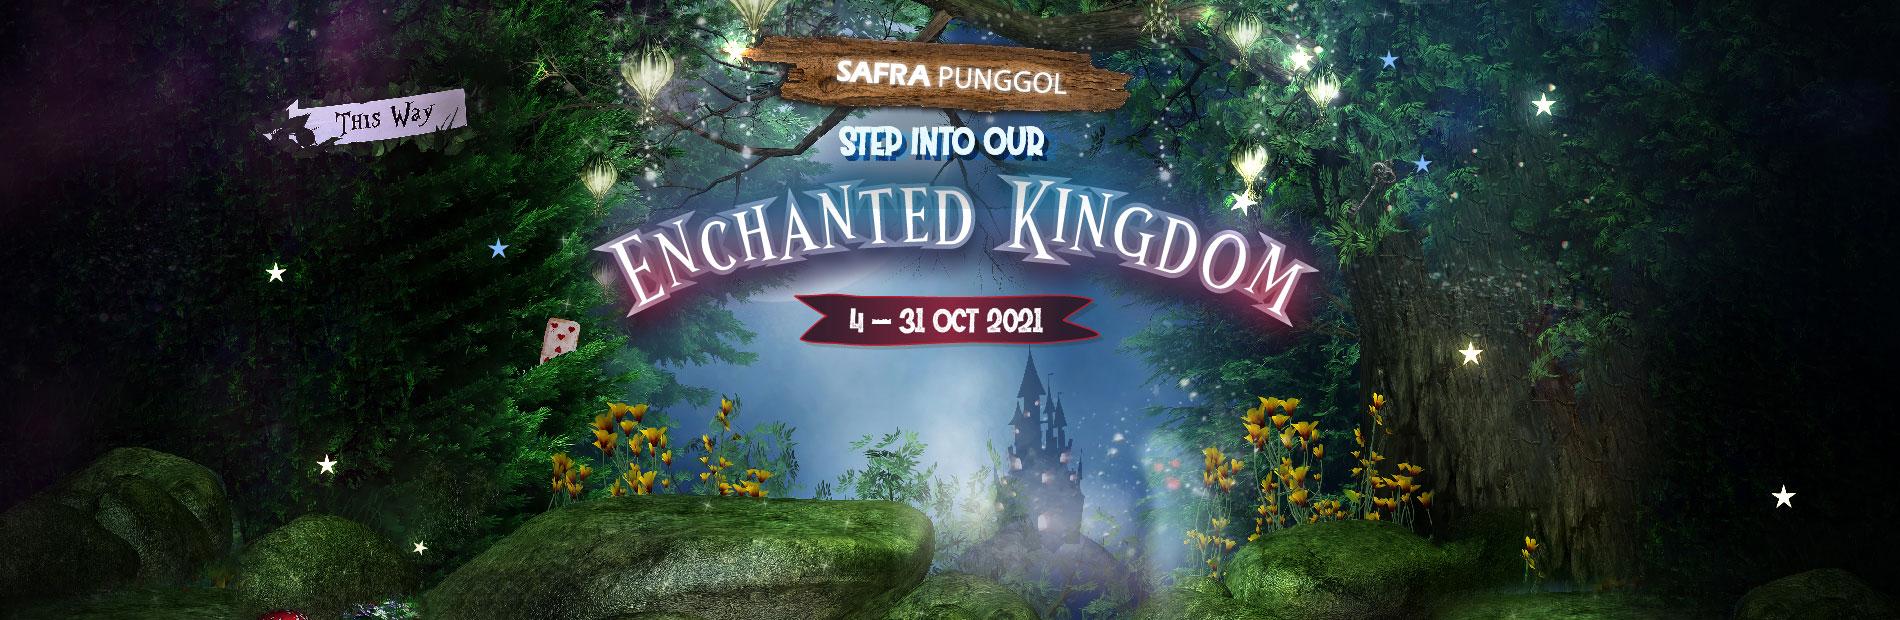 Enchanted-Kingdom-PG-WhatsOn-Banner